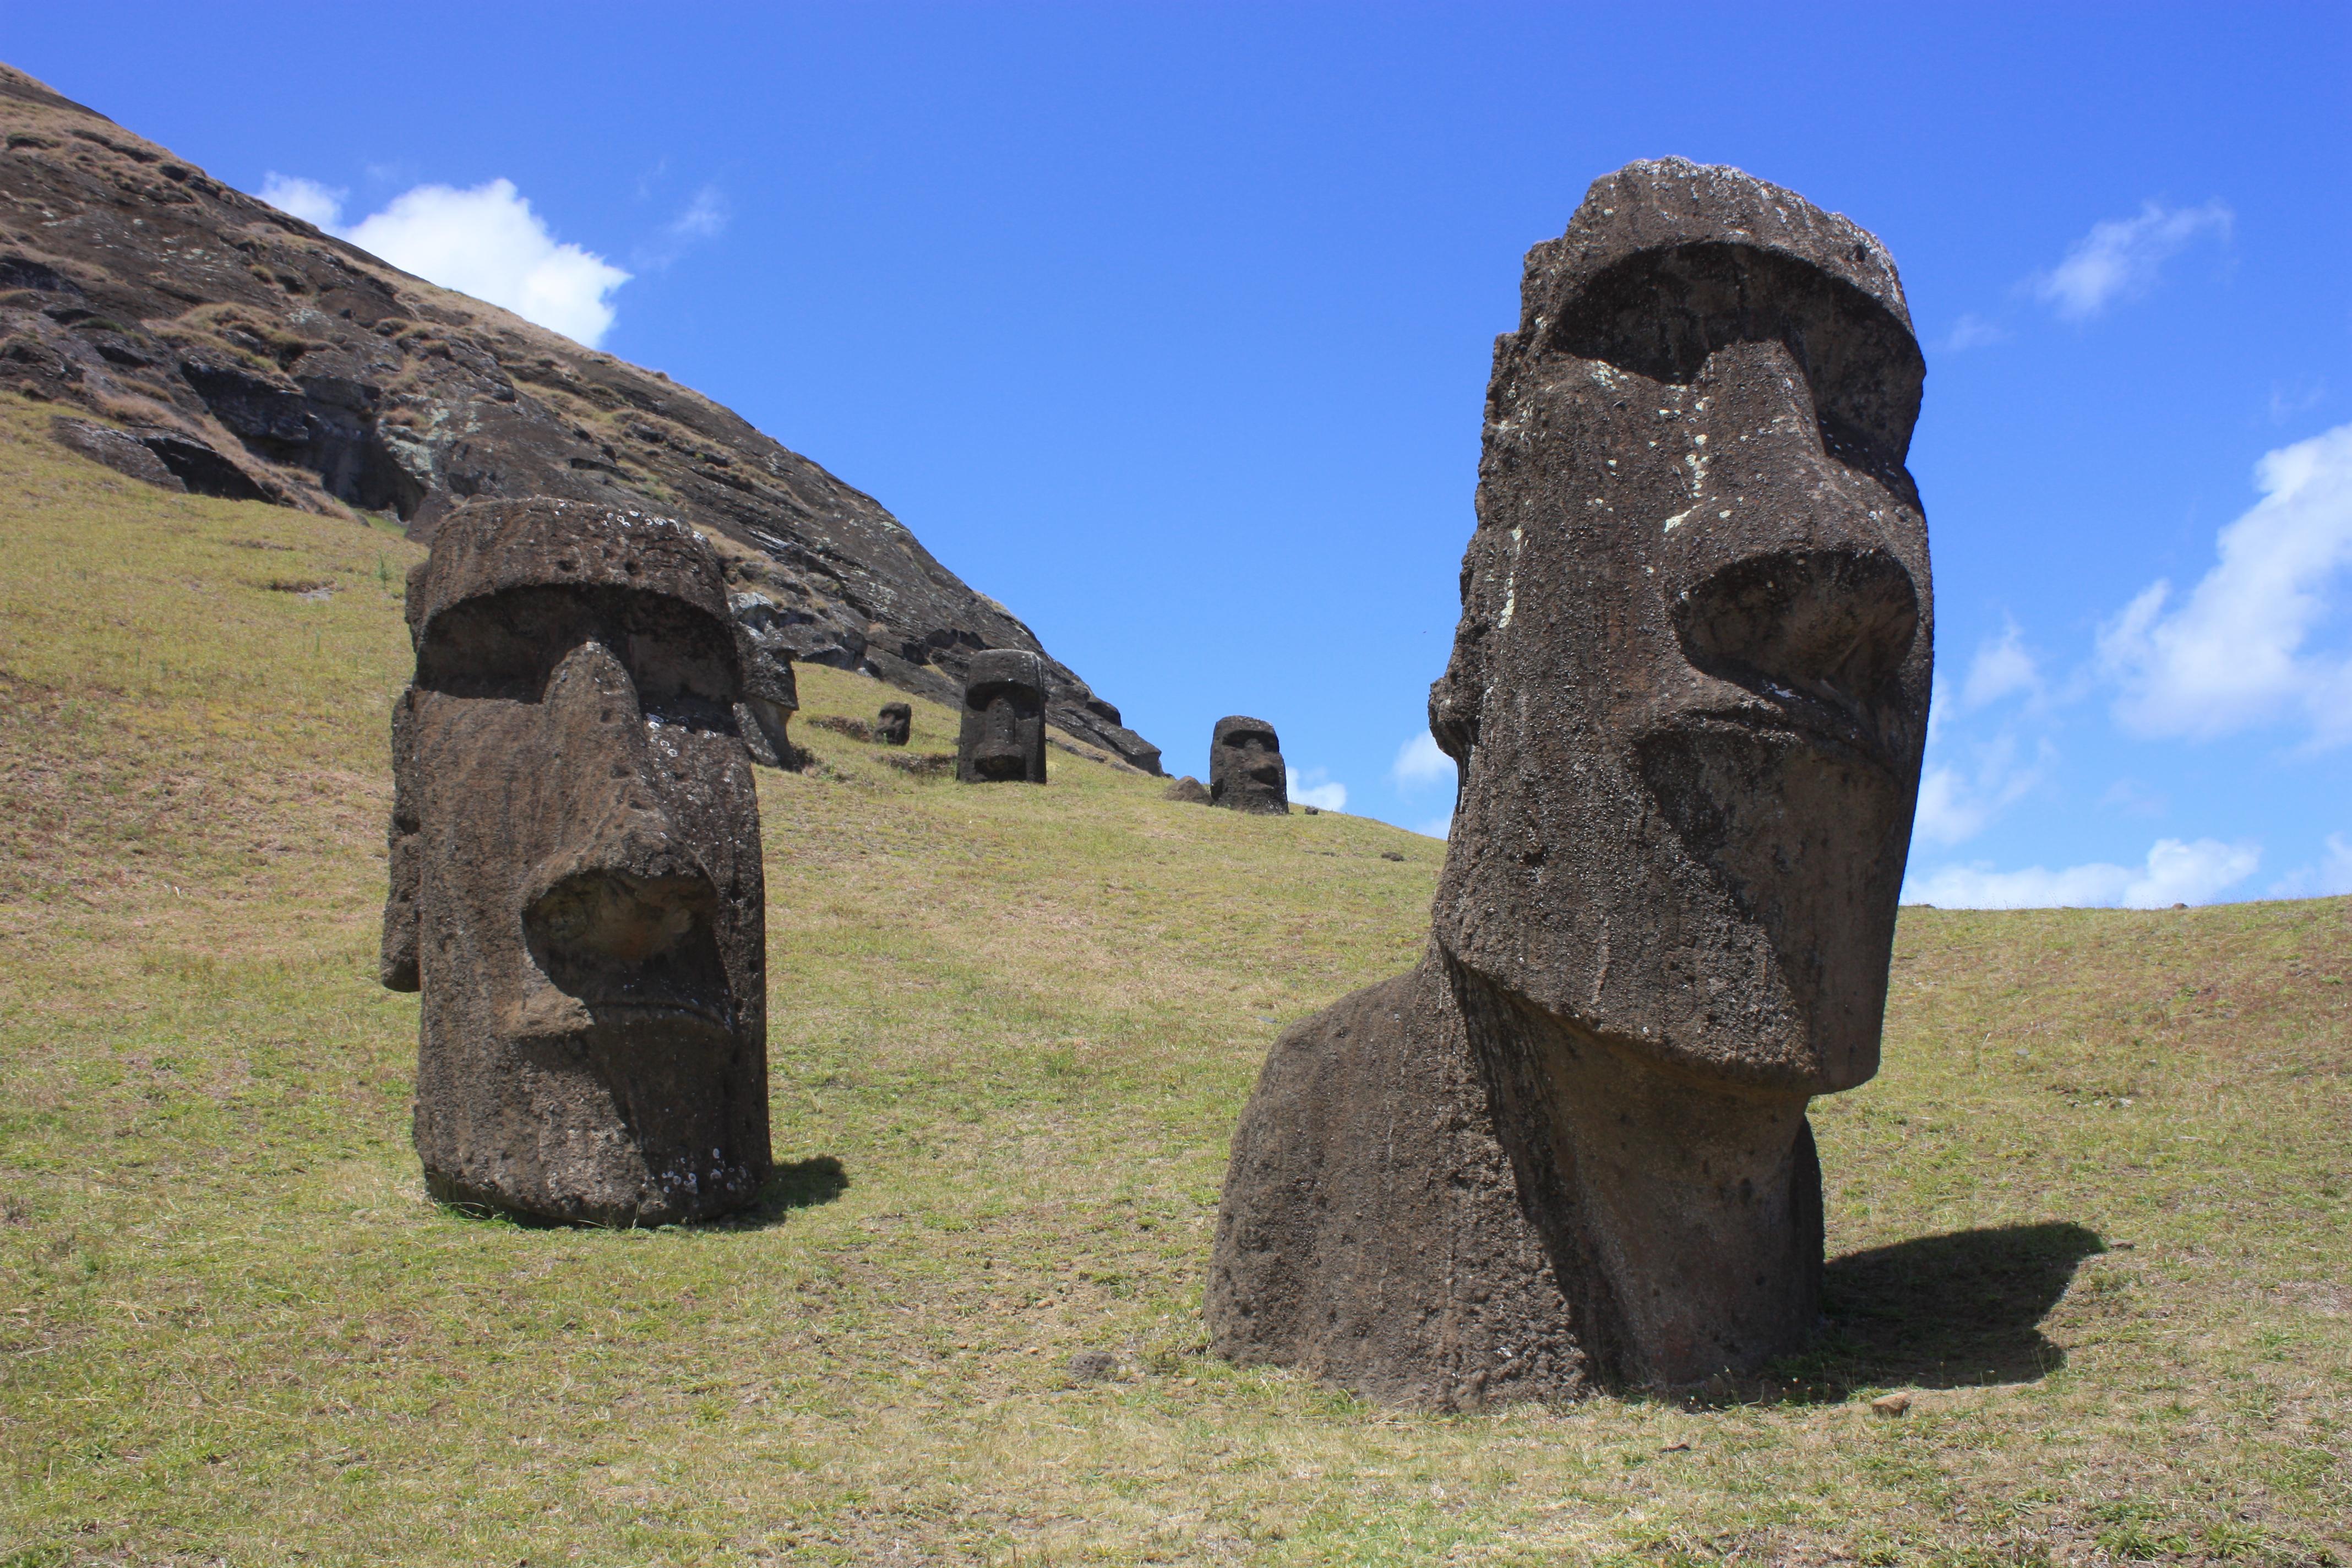 Easter Island Heads Date